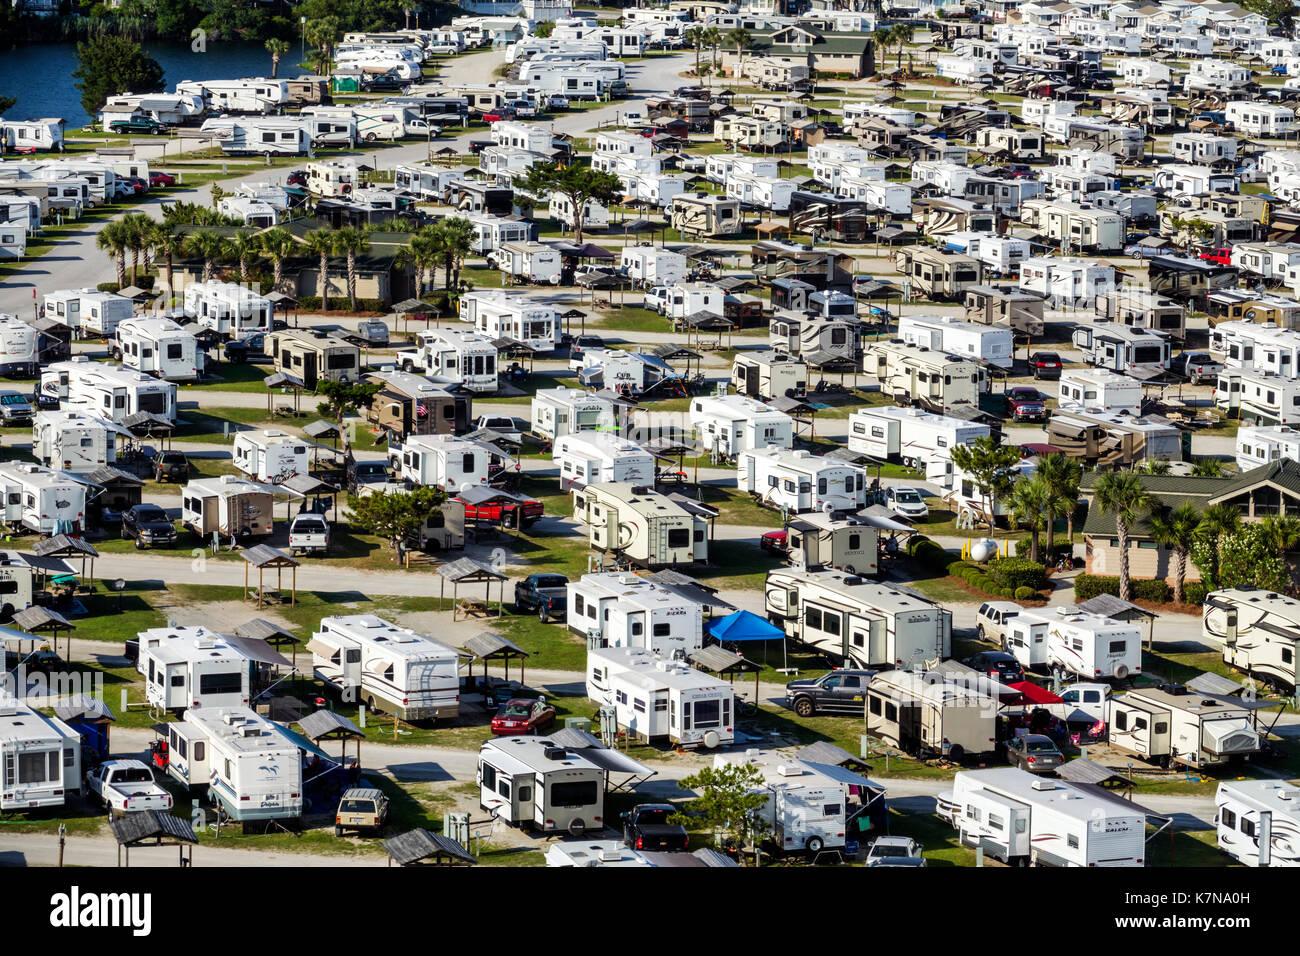 Myrtle Beach South Carolina SC Myrtle Beach RV Travel Park recreational vehicles trailer caravan park campground Stock Photo